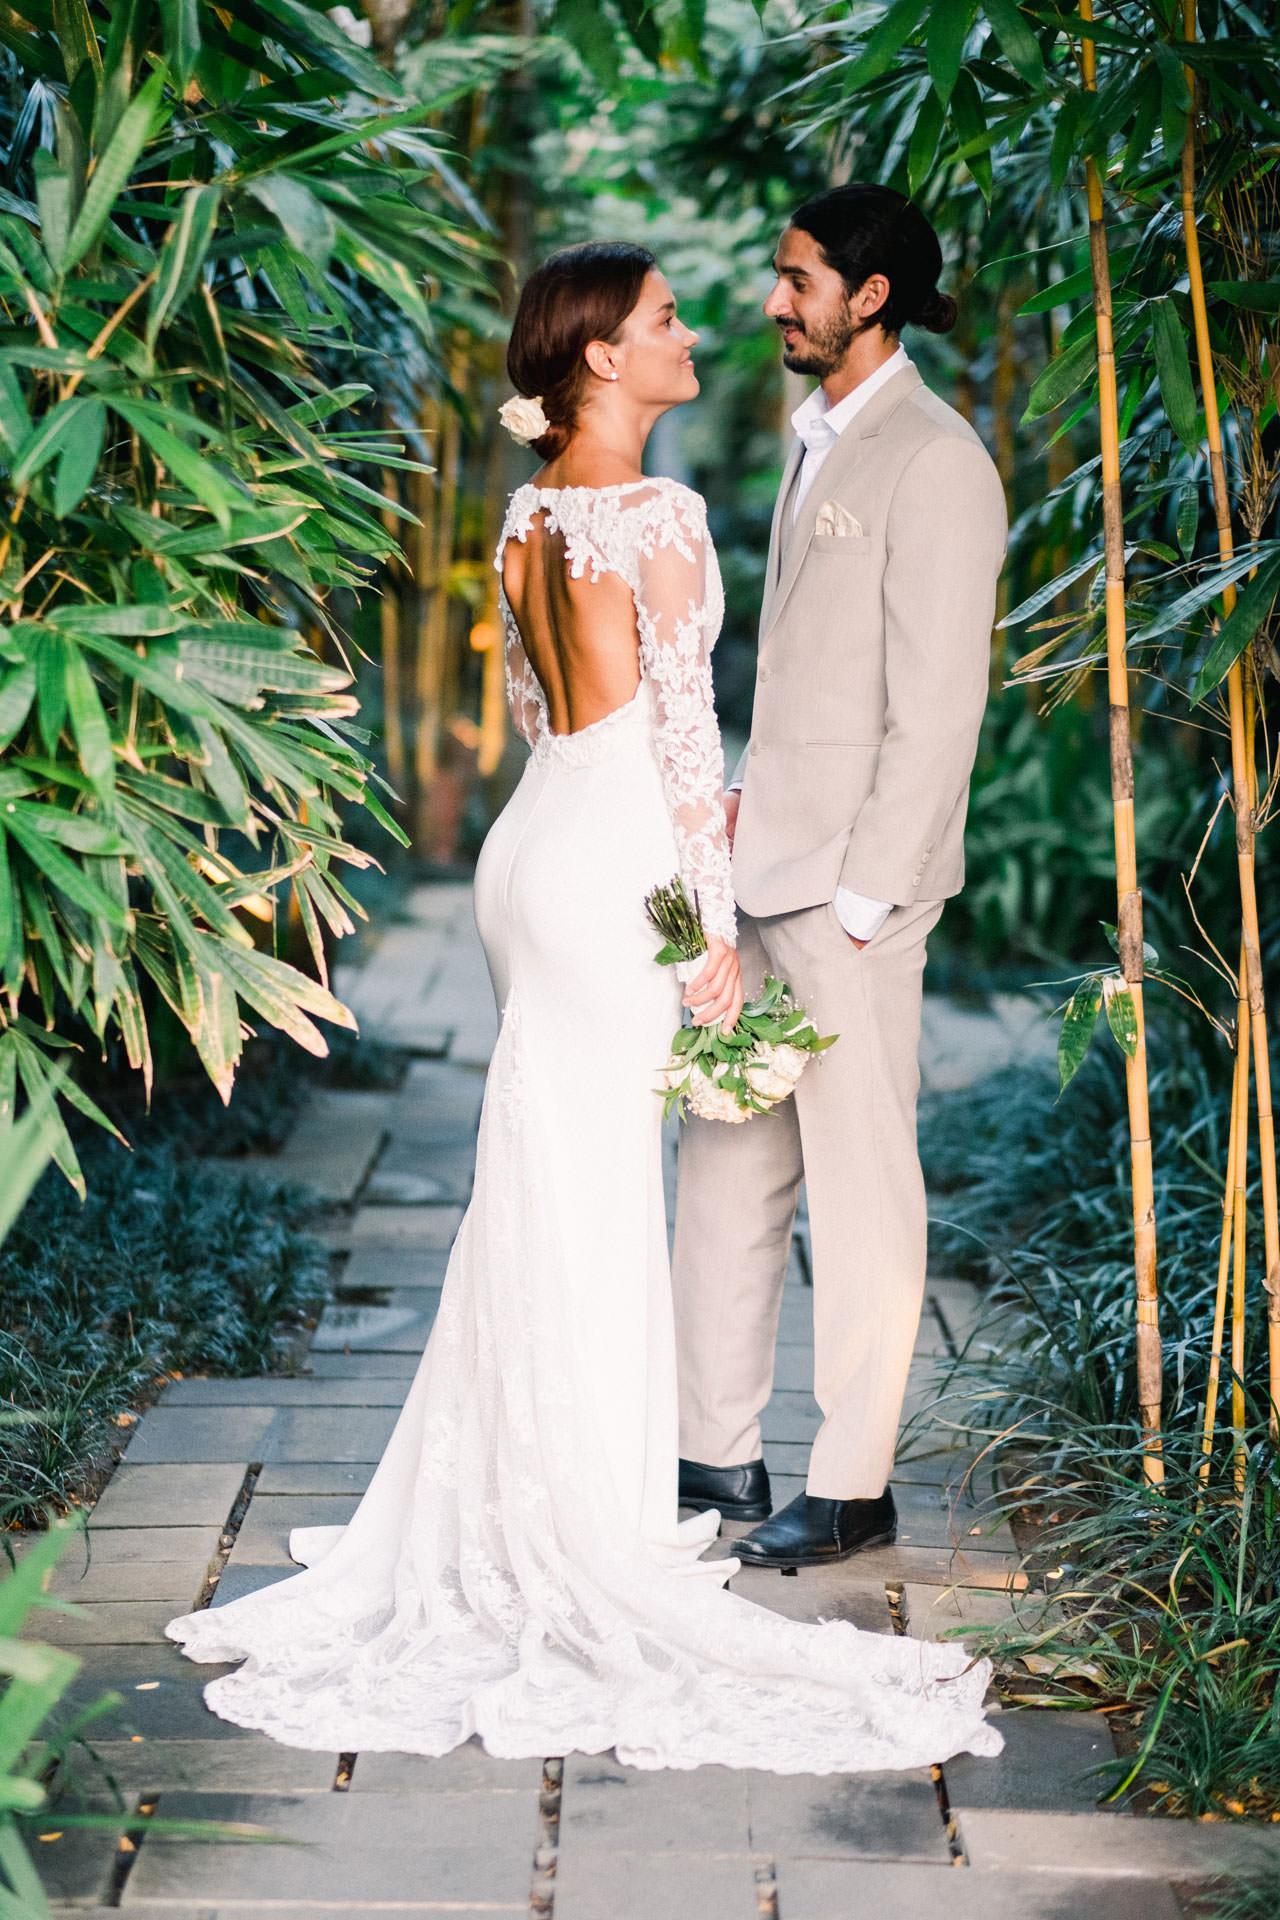 Ubud Wedding at Bisma Eight - Bali Editorial Style Photography 14